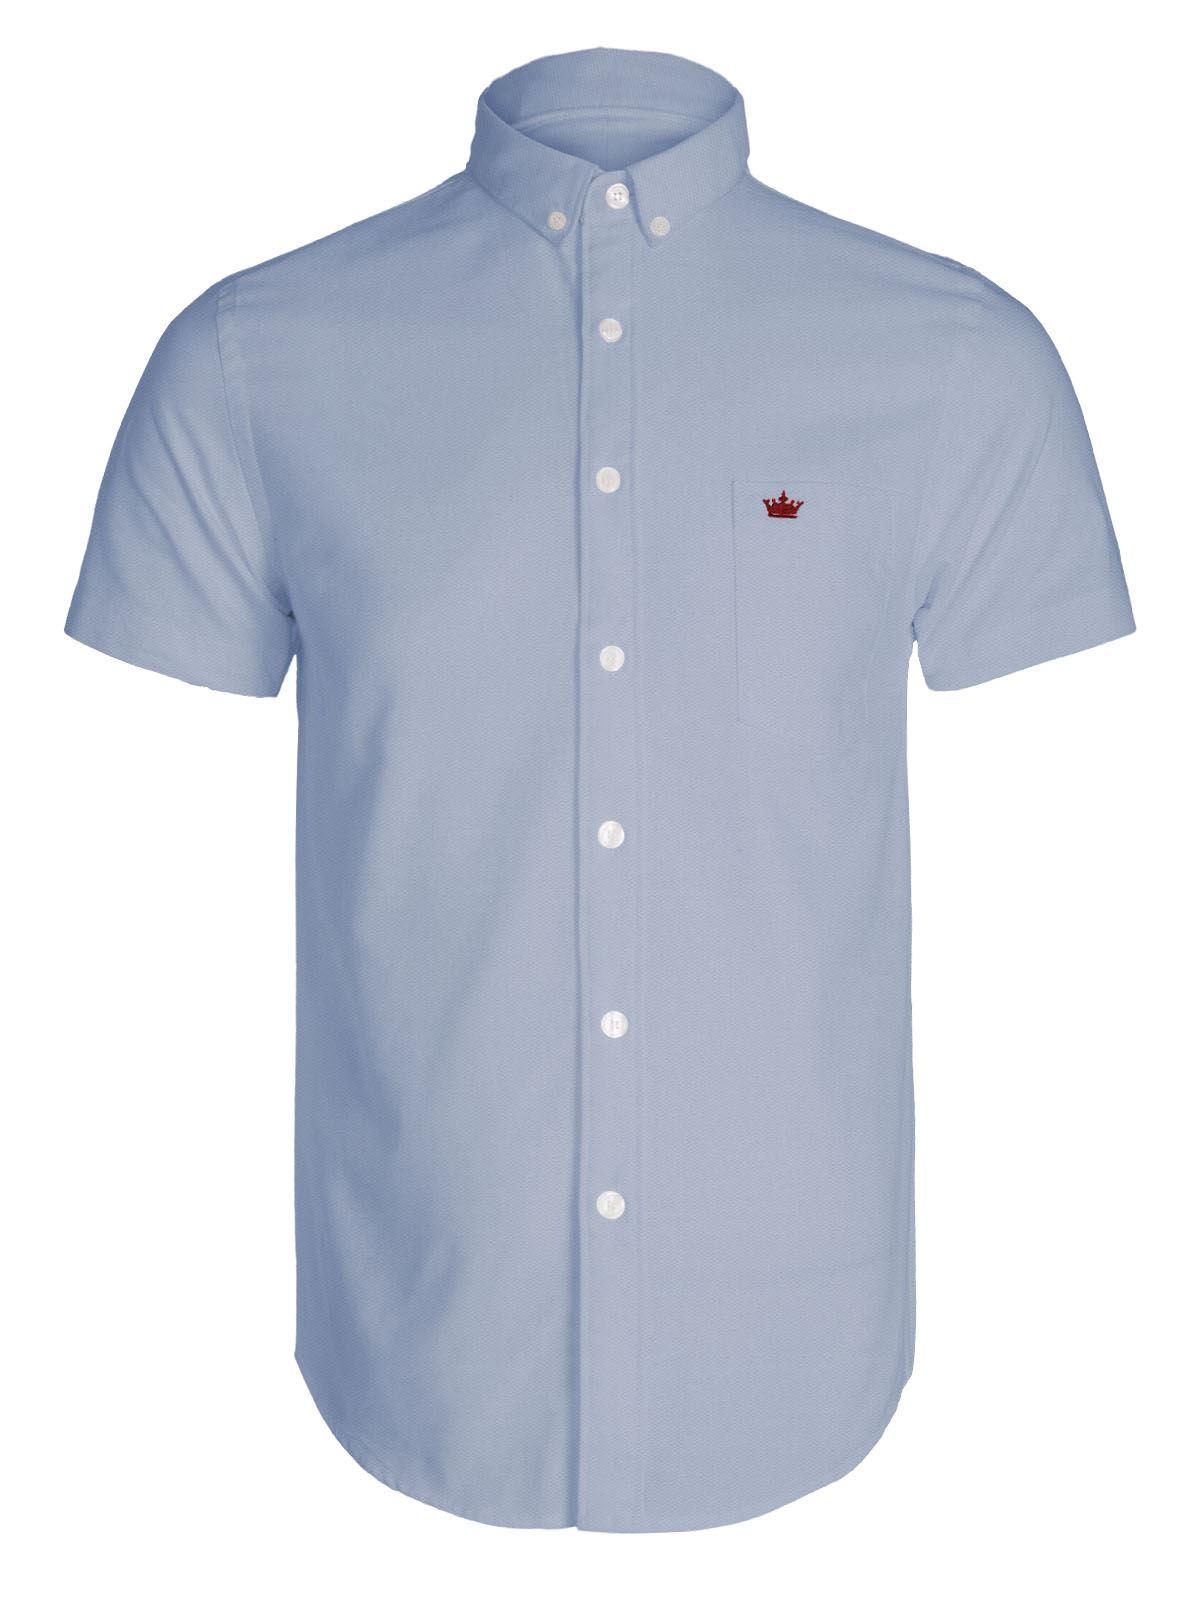 Mens New Short Sleeve Elegant Oxford Shirt Crown Pocket